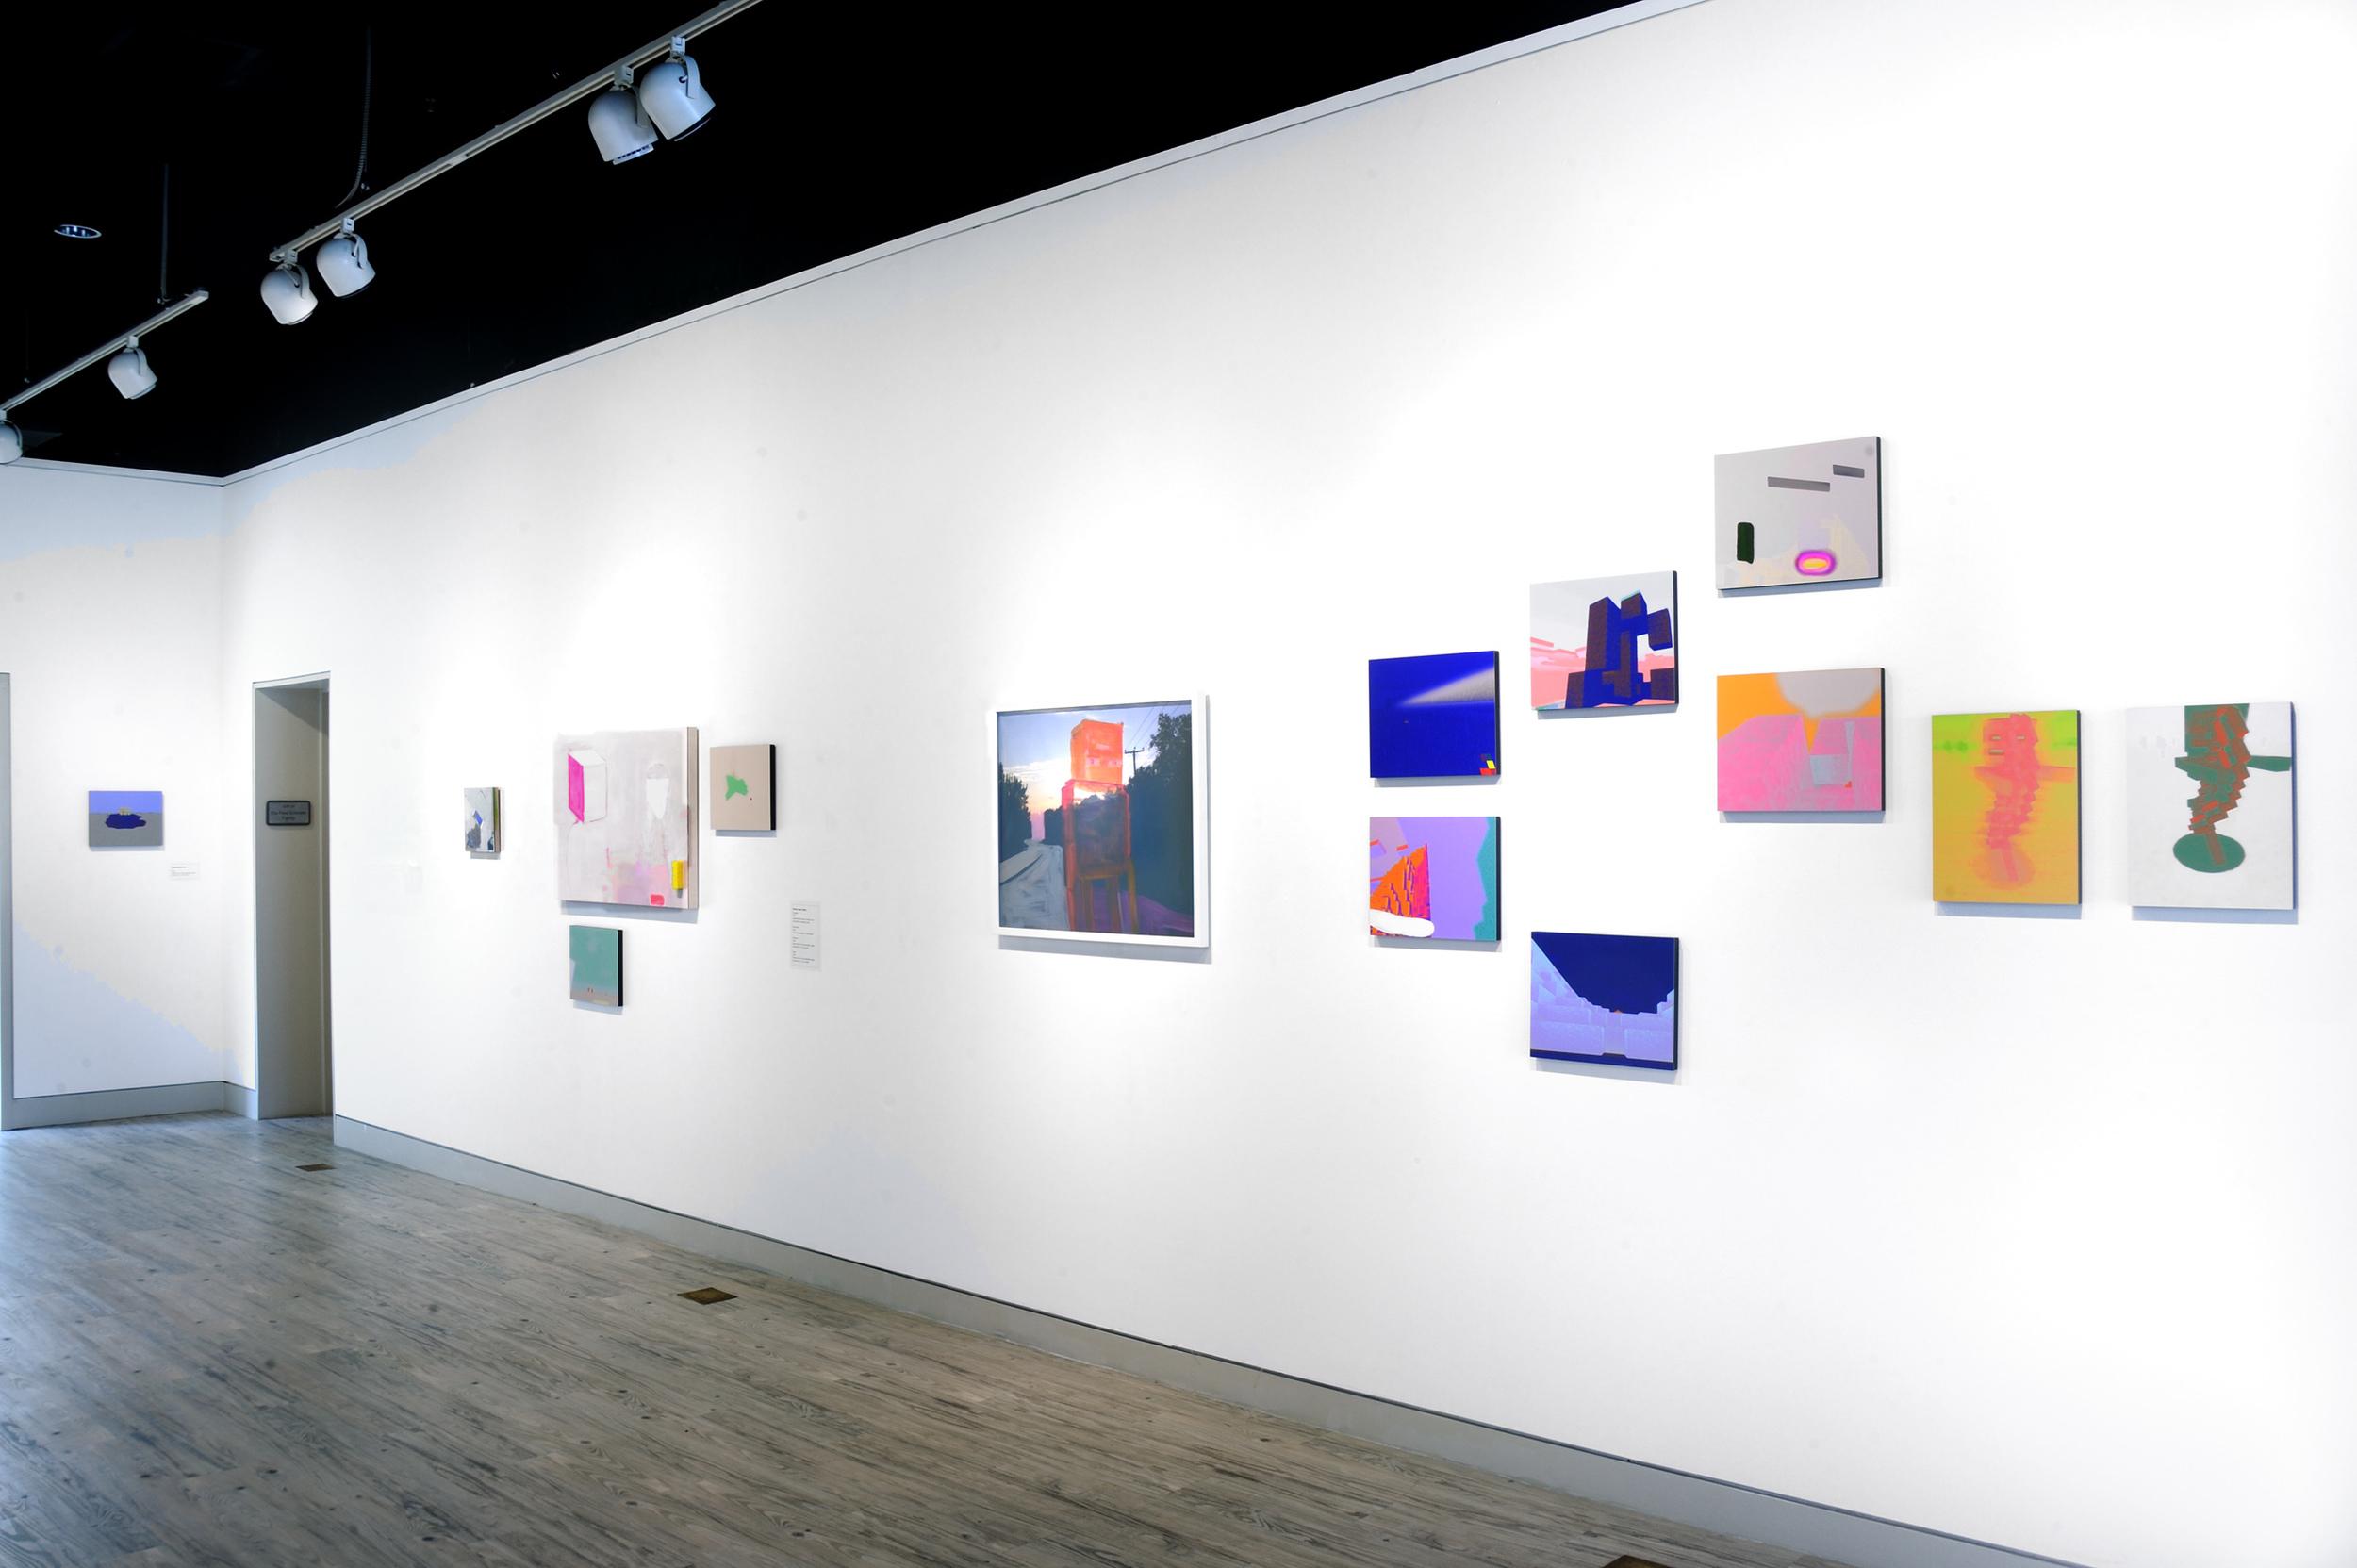 Installation view of Screenshot show Arlington Arts Center, Wyatt Gallery July 2015